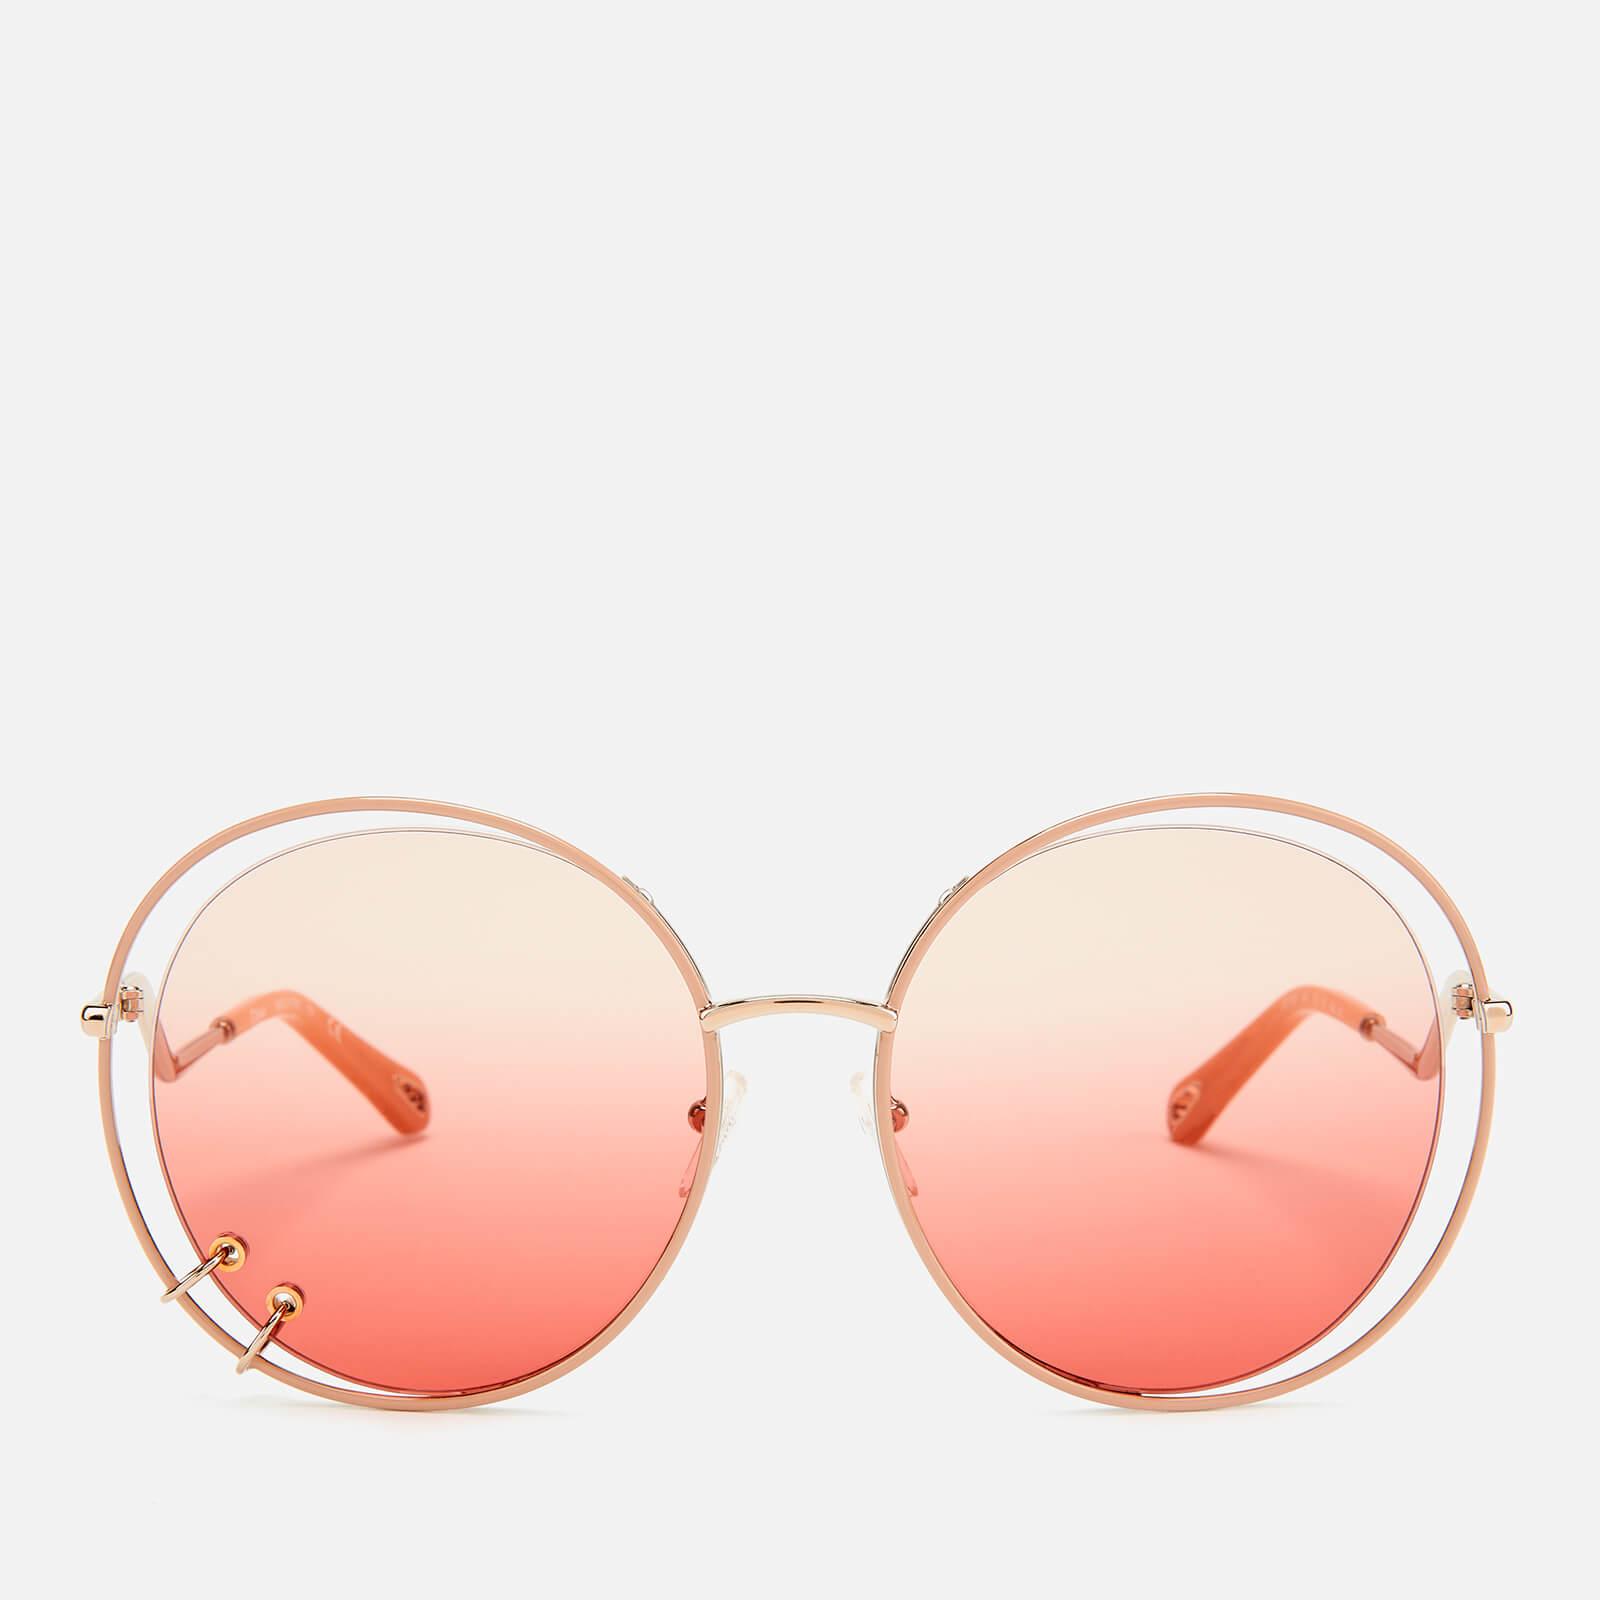 d70854b0c1b5 Chloe Women's Wendy Round Frame Sunglasses - Rose Gold ...